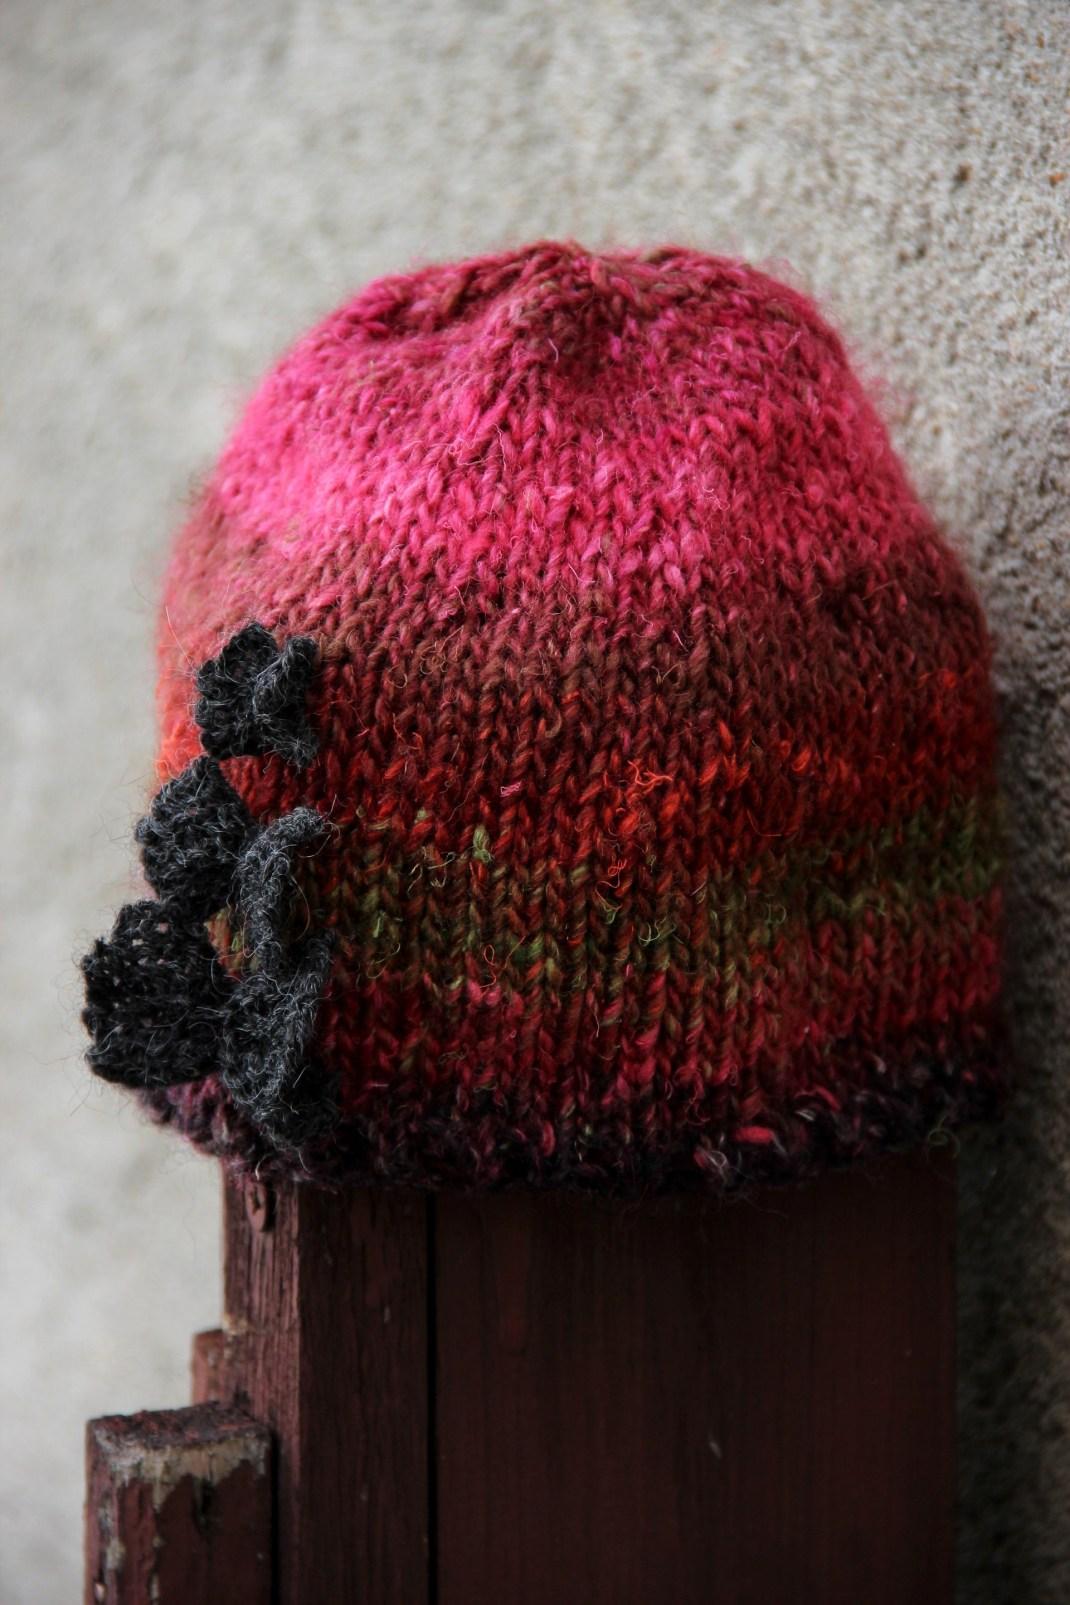 silk garden Papillons hat kit